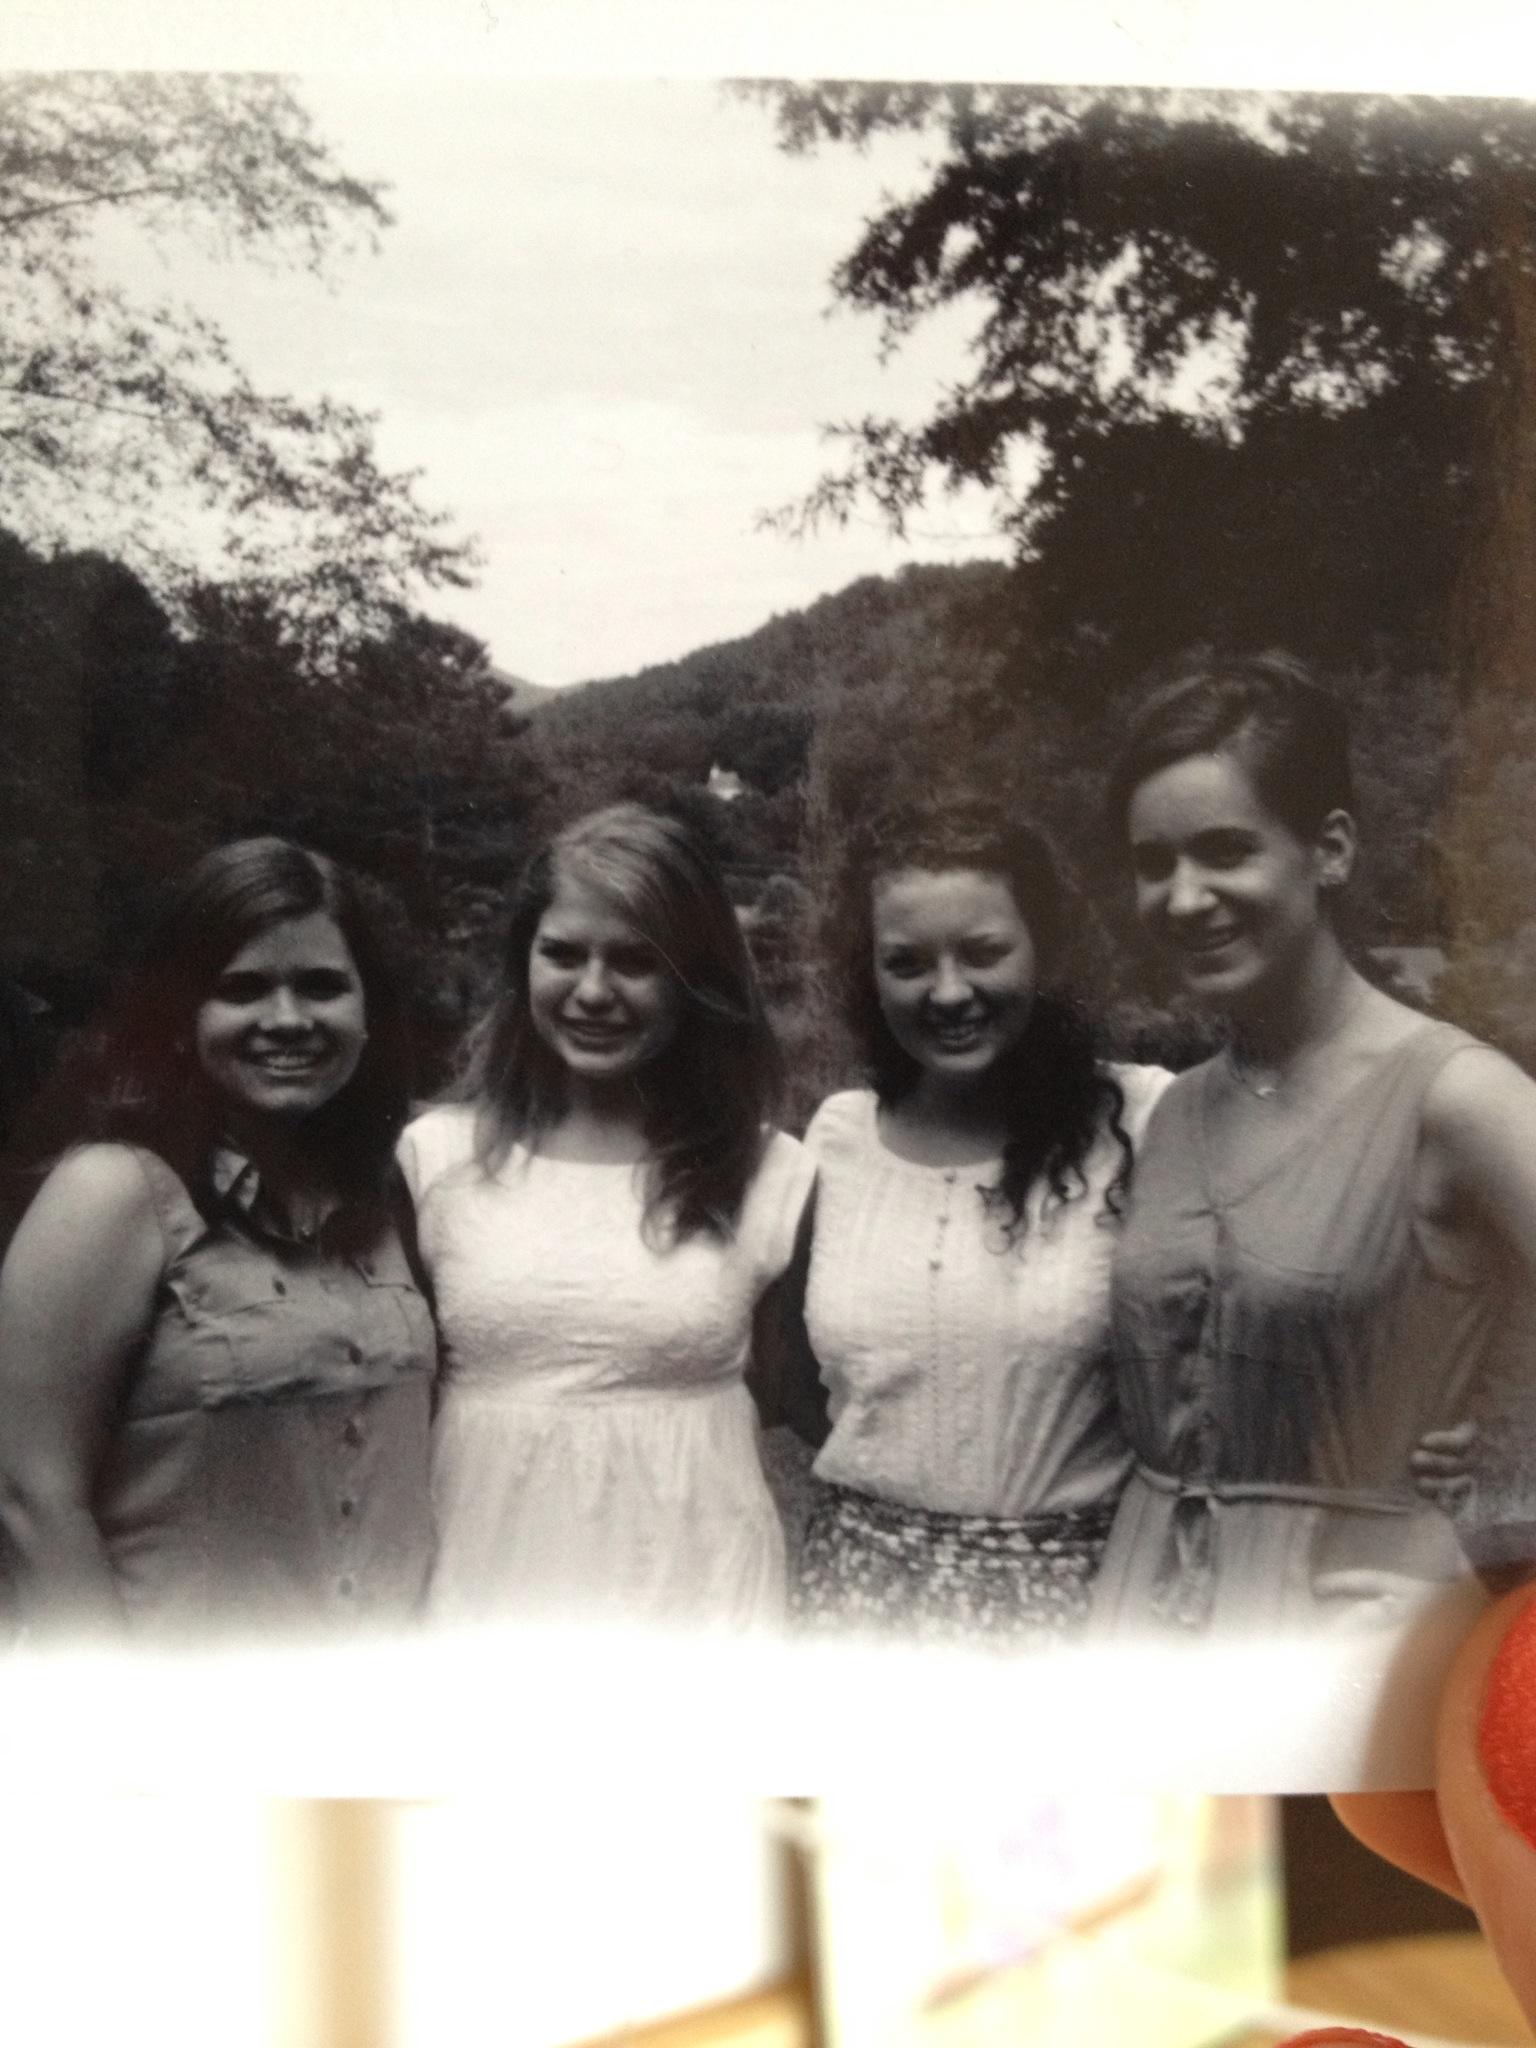 Reunited at Rachel's bridal shower :)